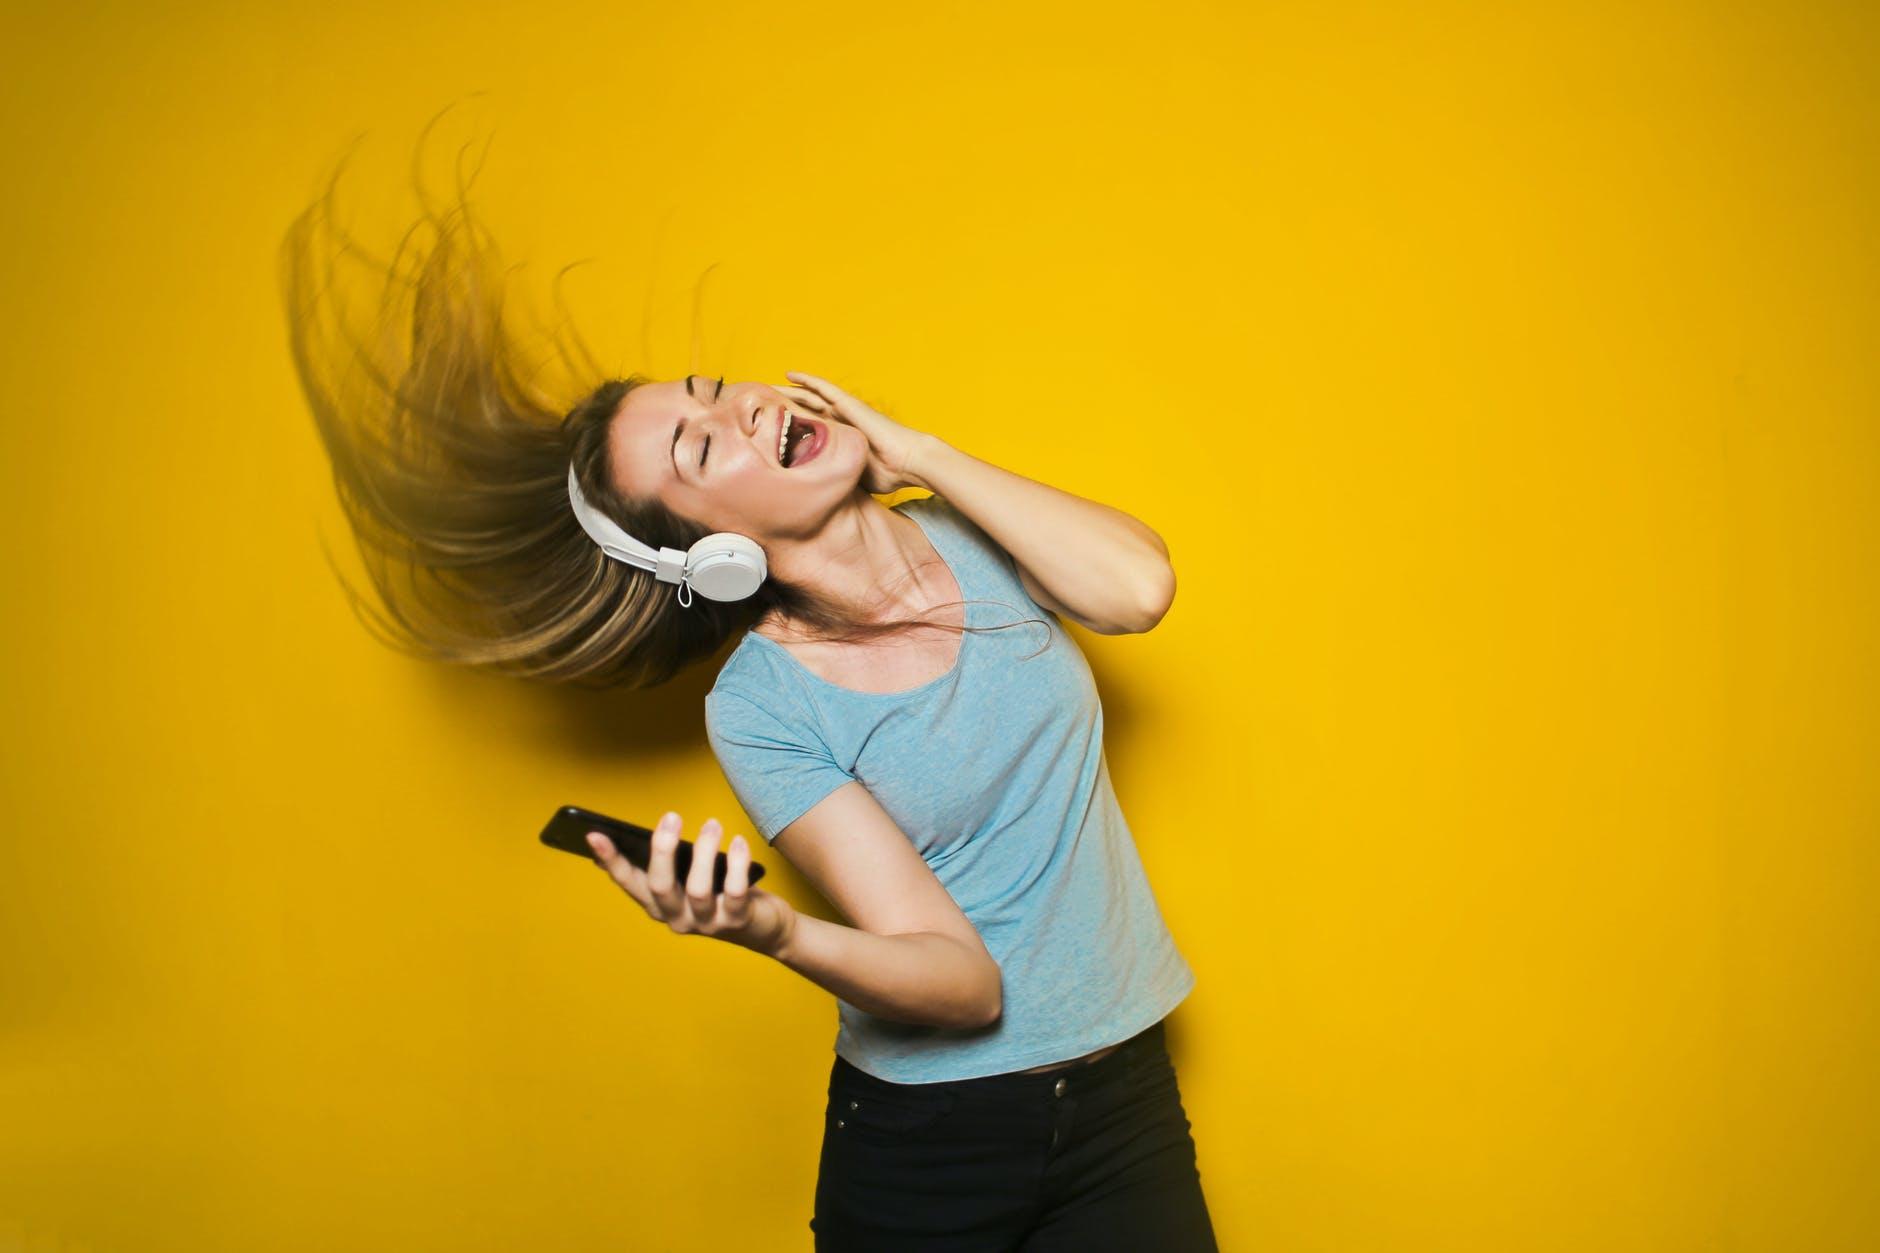 Movistar incorpora Deezer a su oferta de contenidos